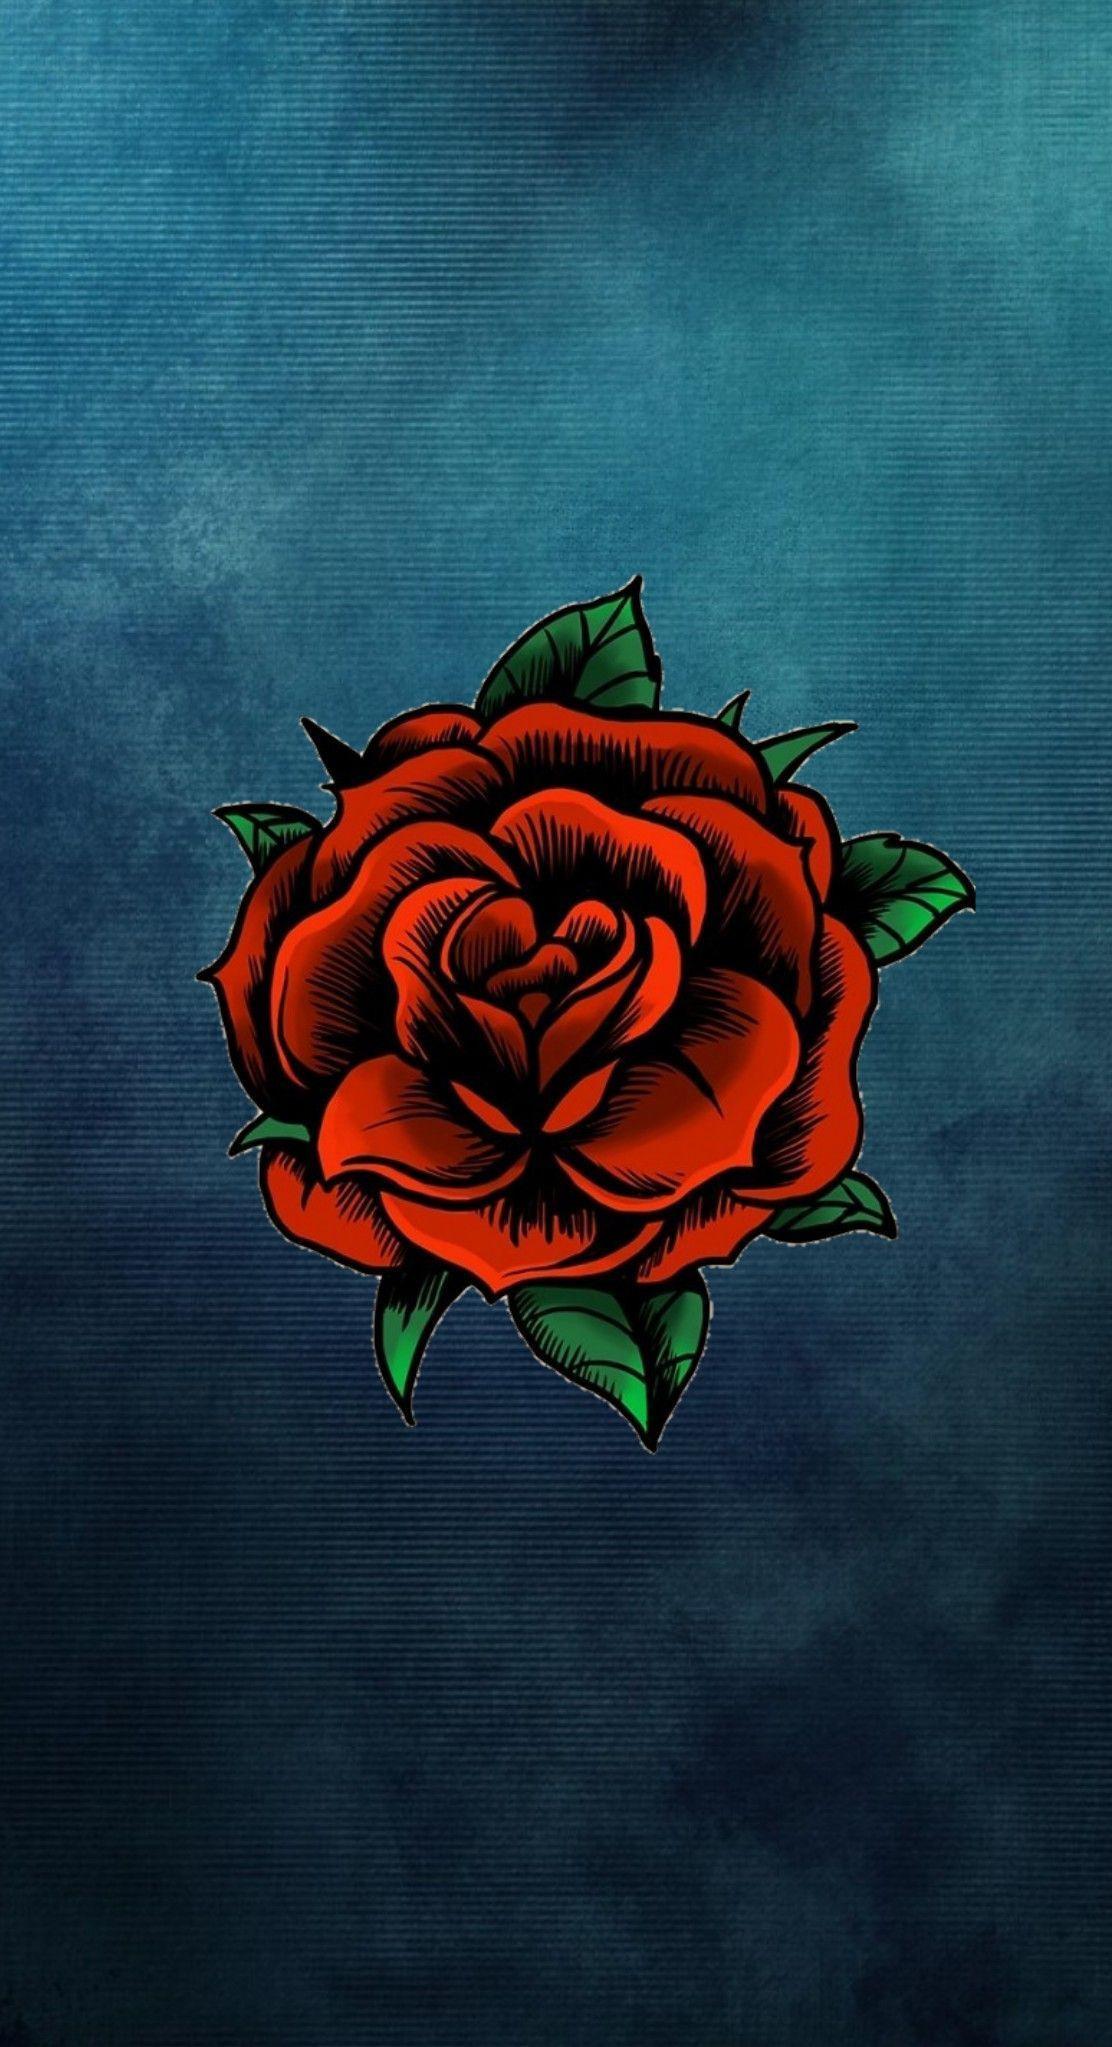 Pin On Kevinli 87 Aesthetic cartoon rose wallpaper